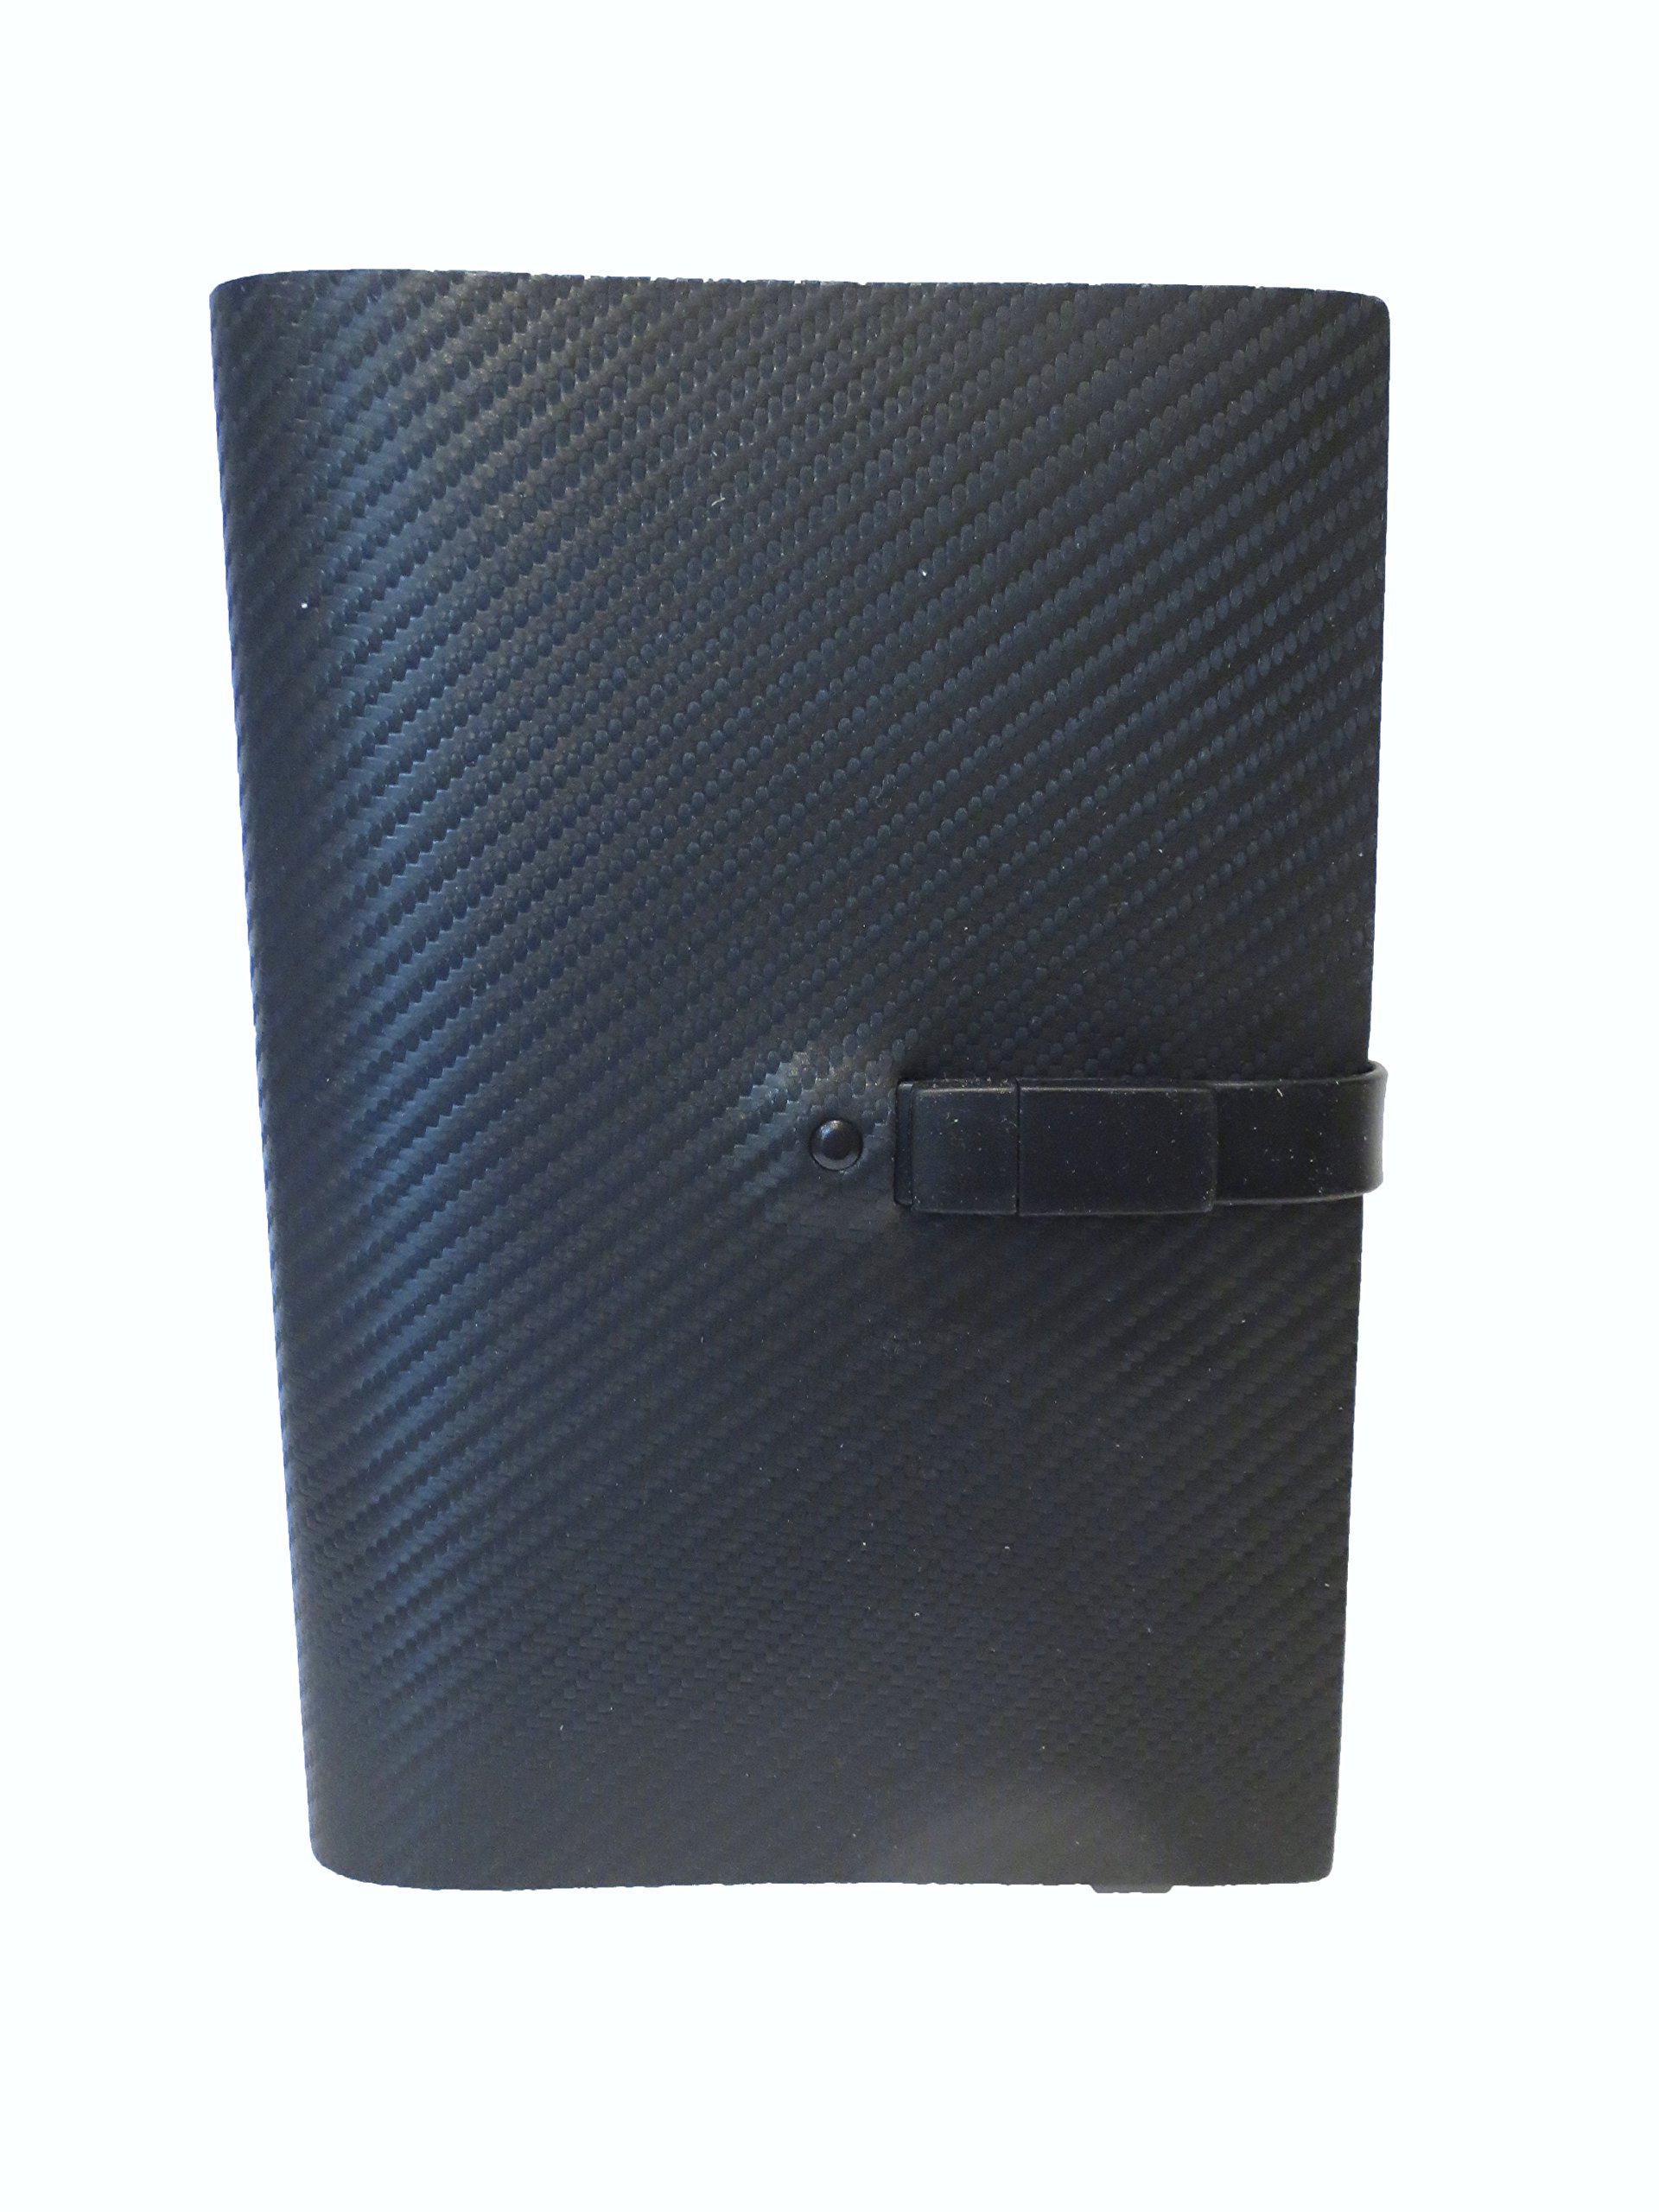 Pinetti 6x8'' Quattrogiga Black Leather Notebook with 4GB USB Drive